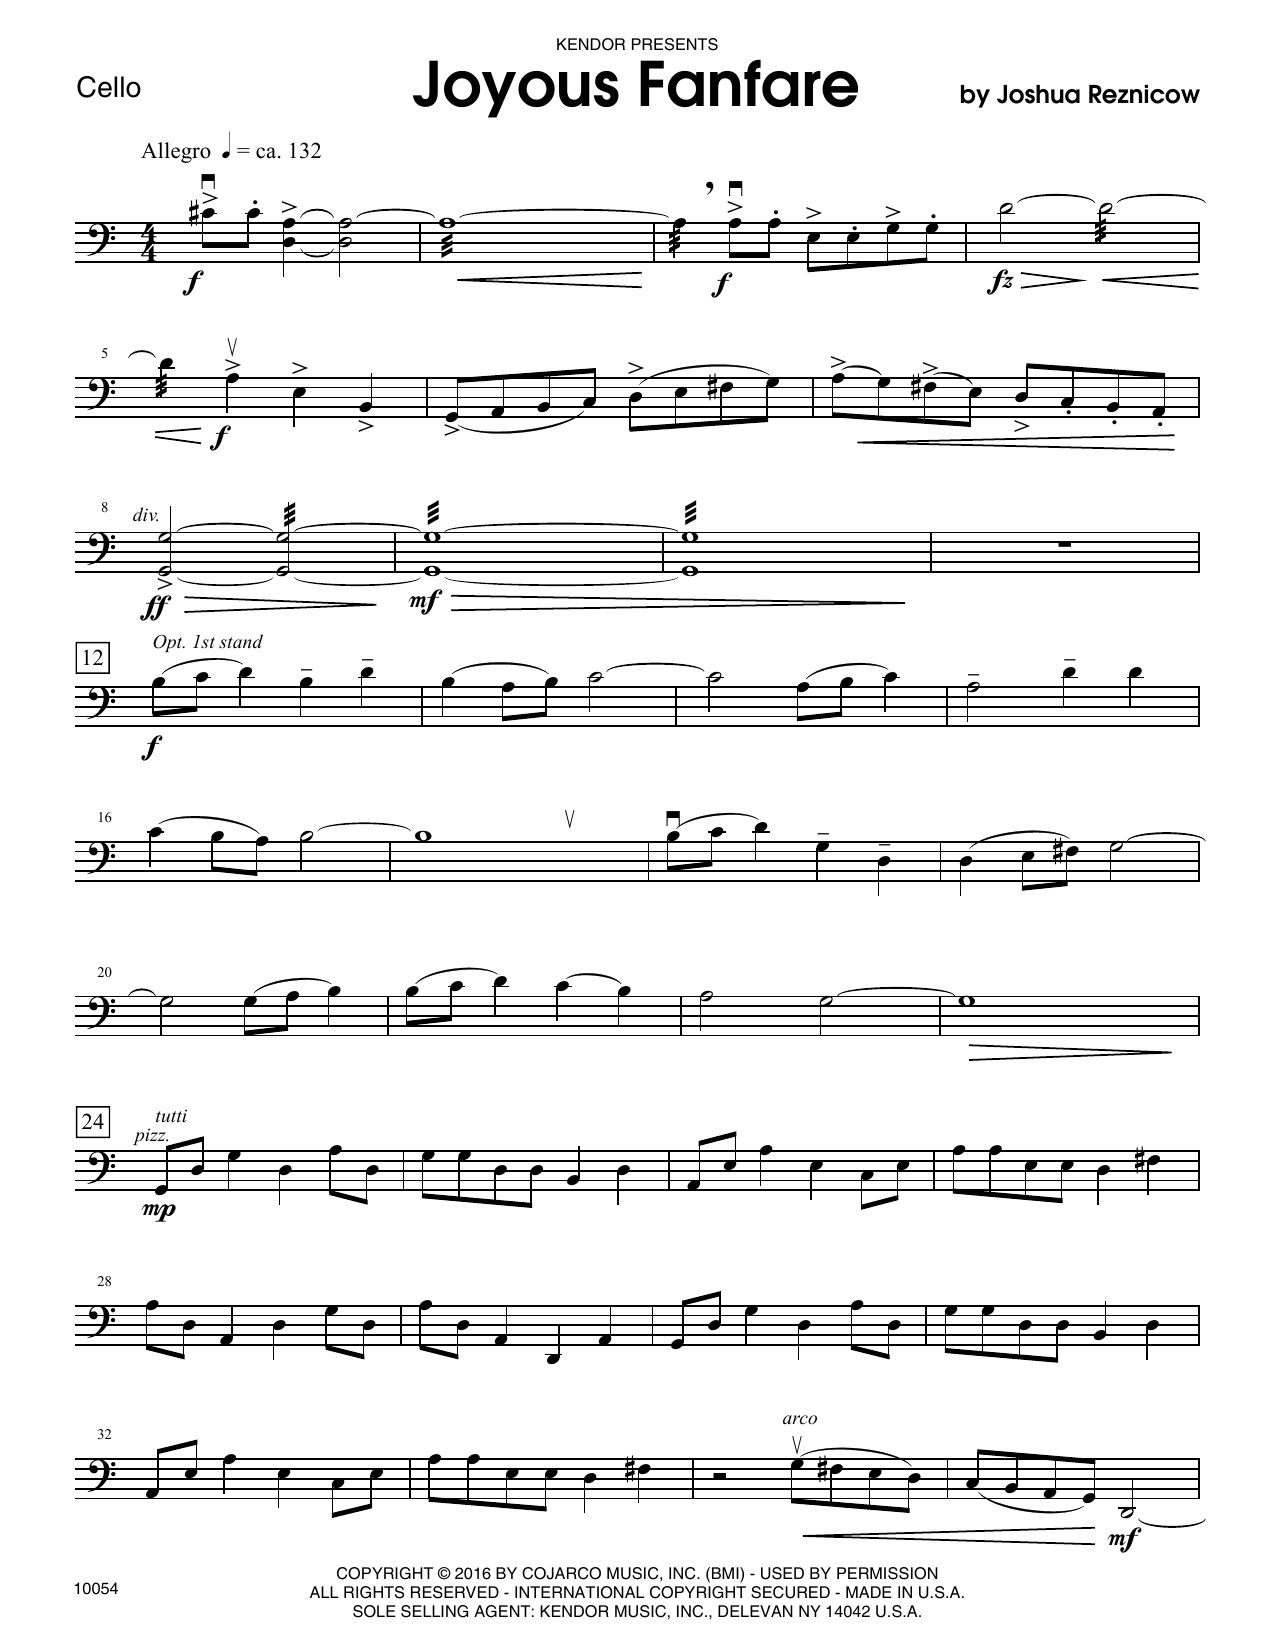 Joyous Fanfare - Cello Sheet Music